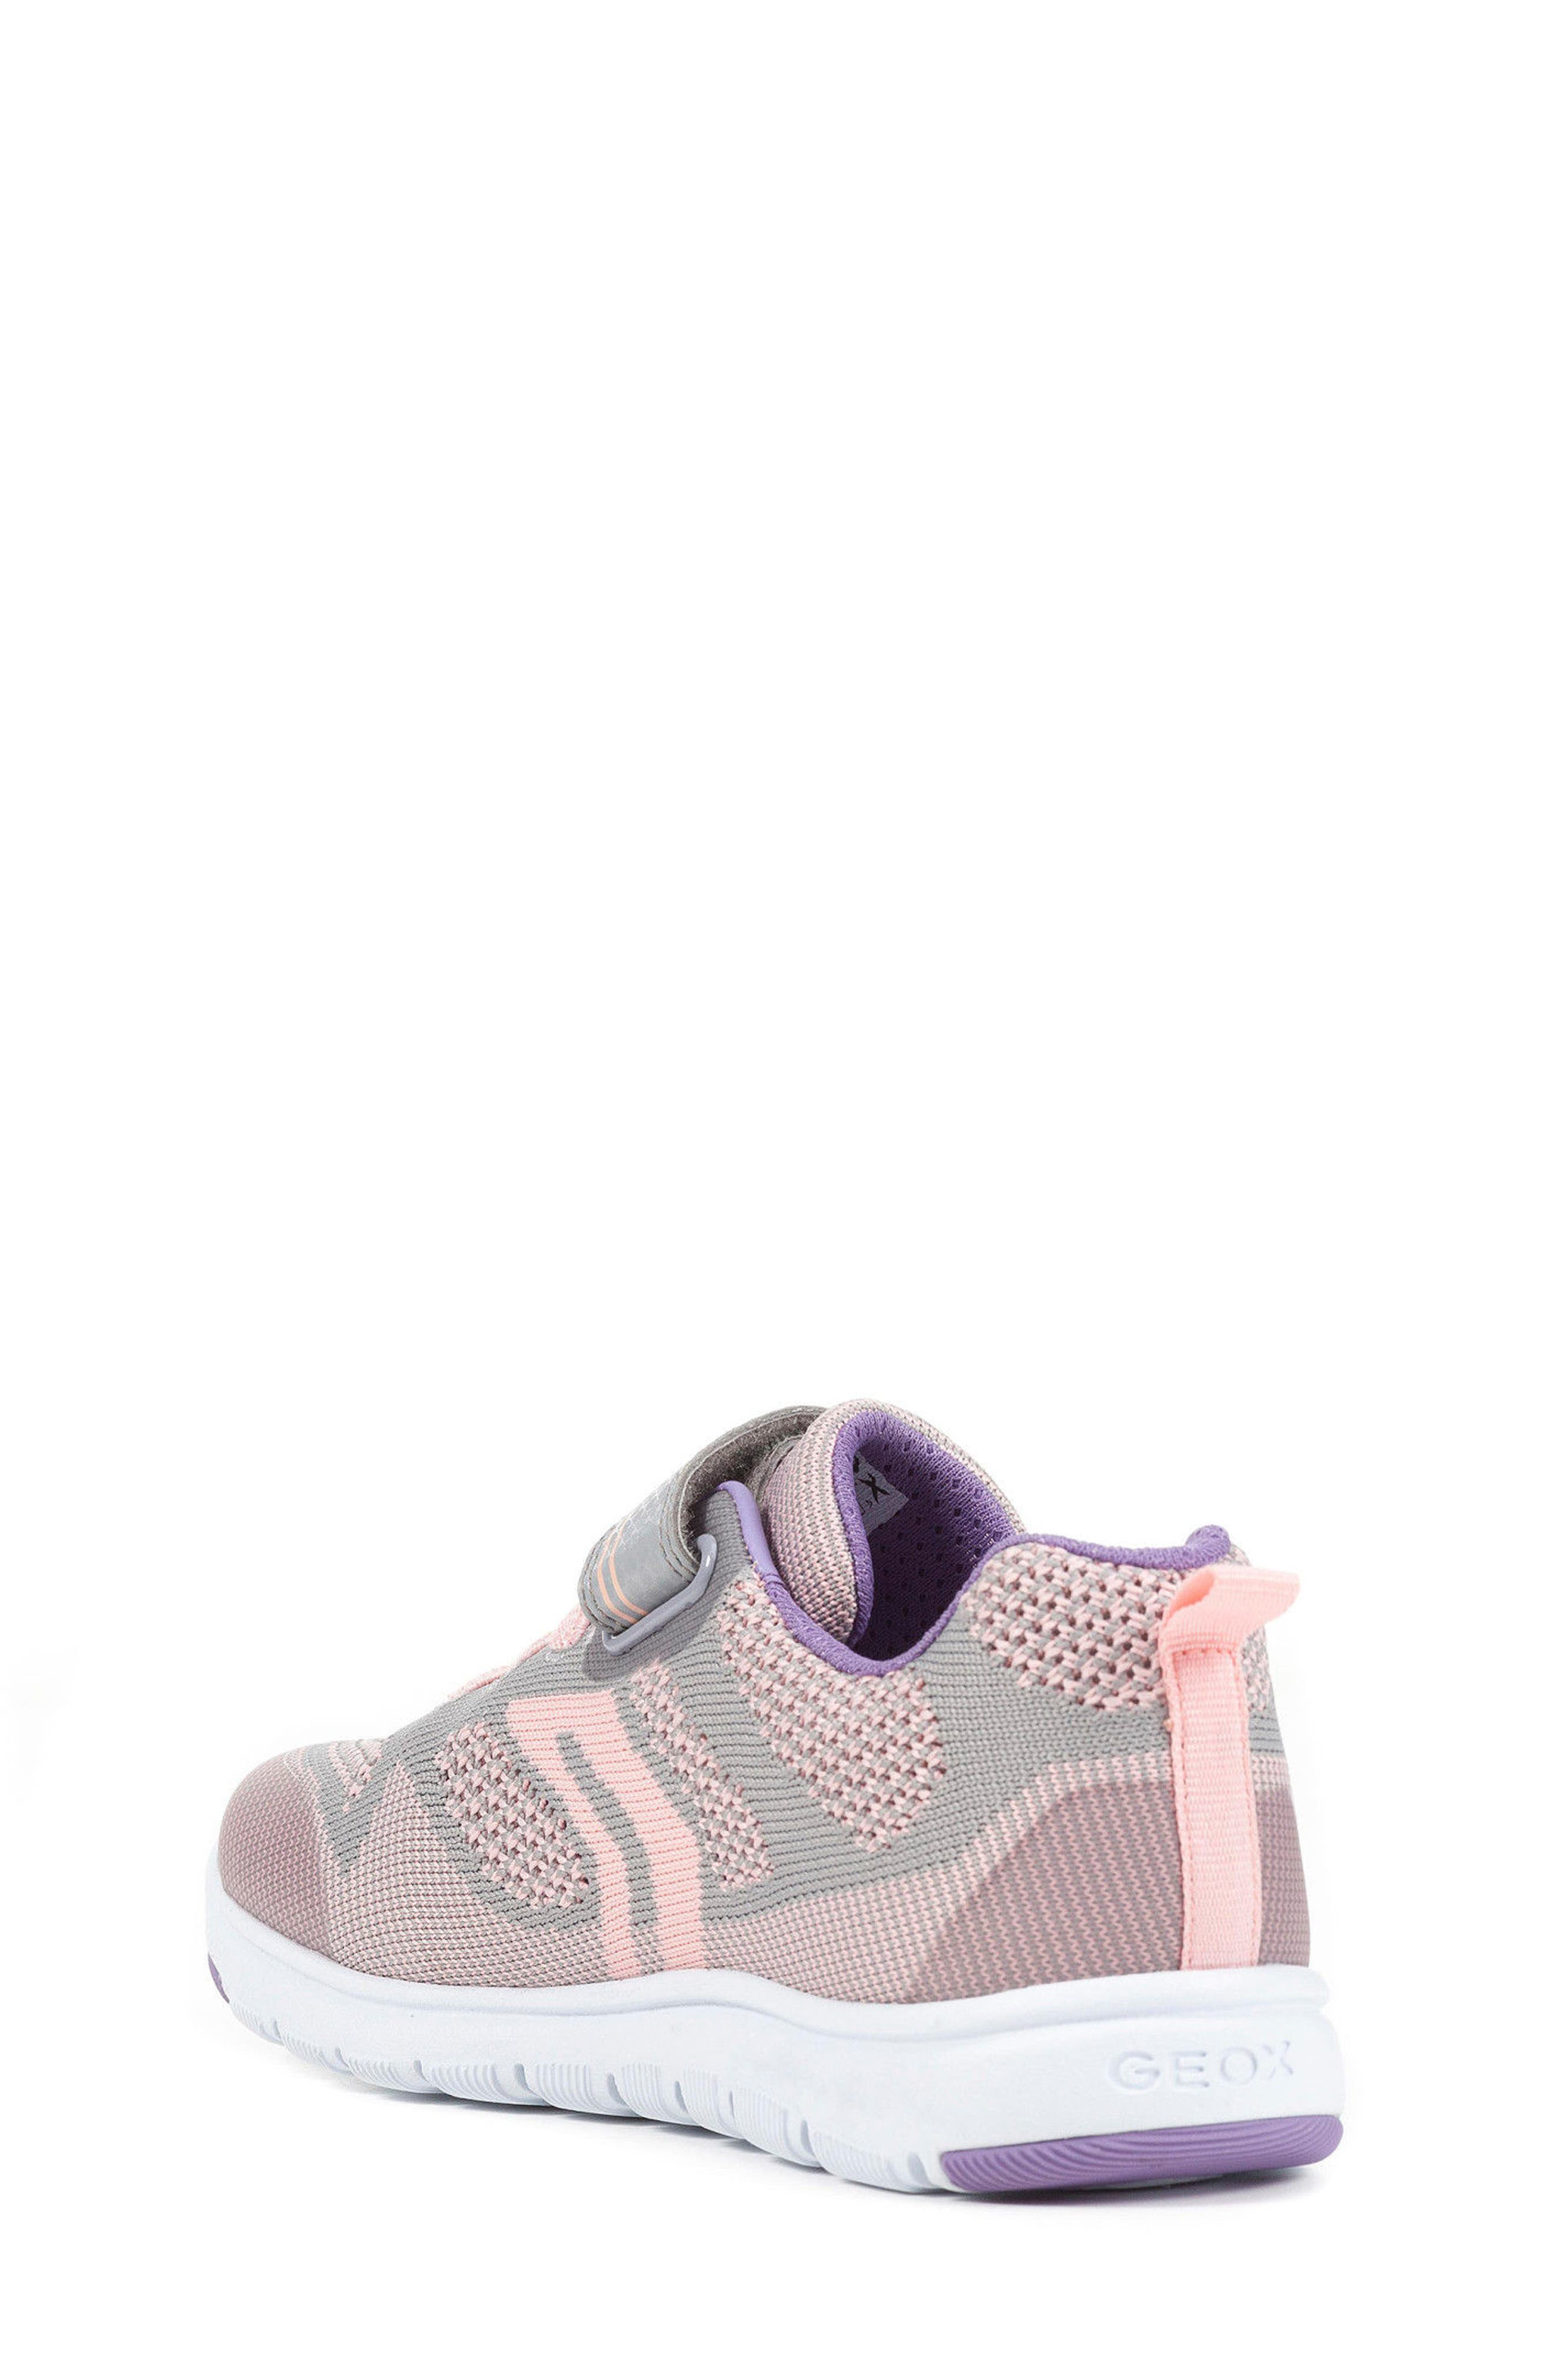 Alternate Image 2  - Geox Xunday Low Top Woven Sneaker (Toddler, Little Kid & Big Kid)